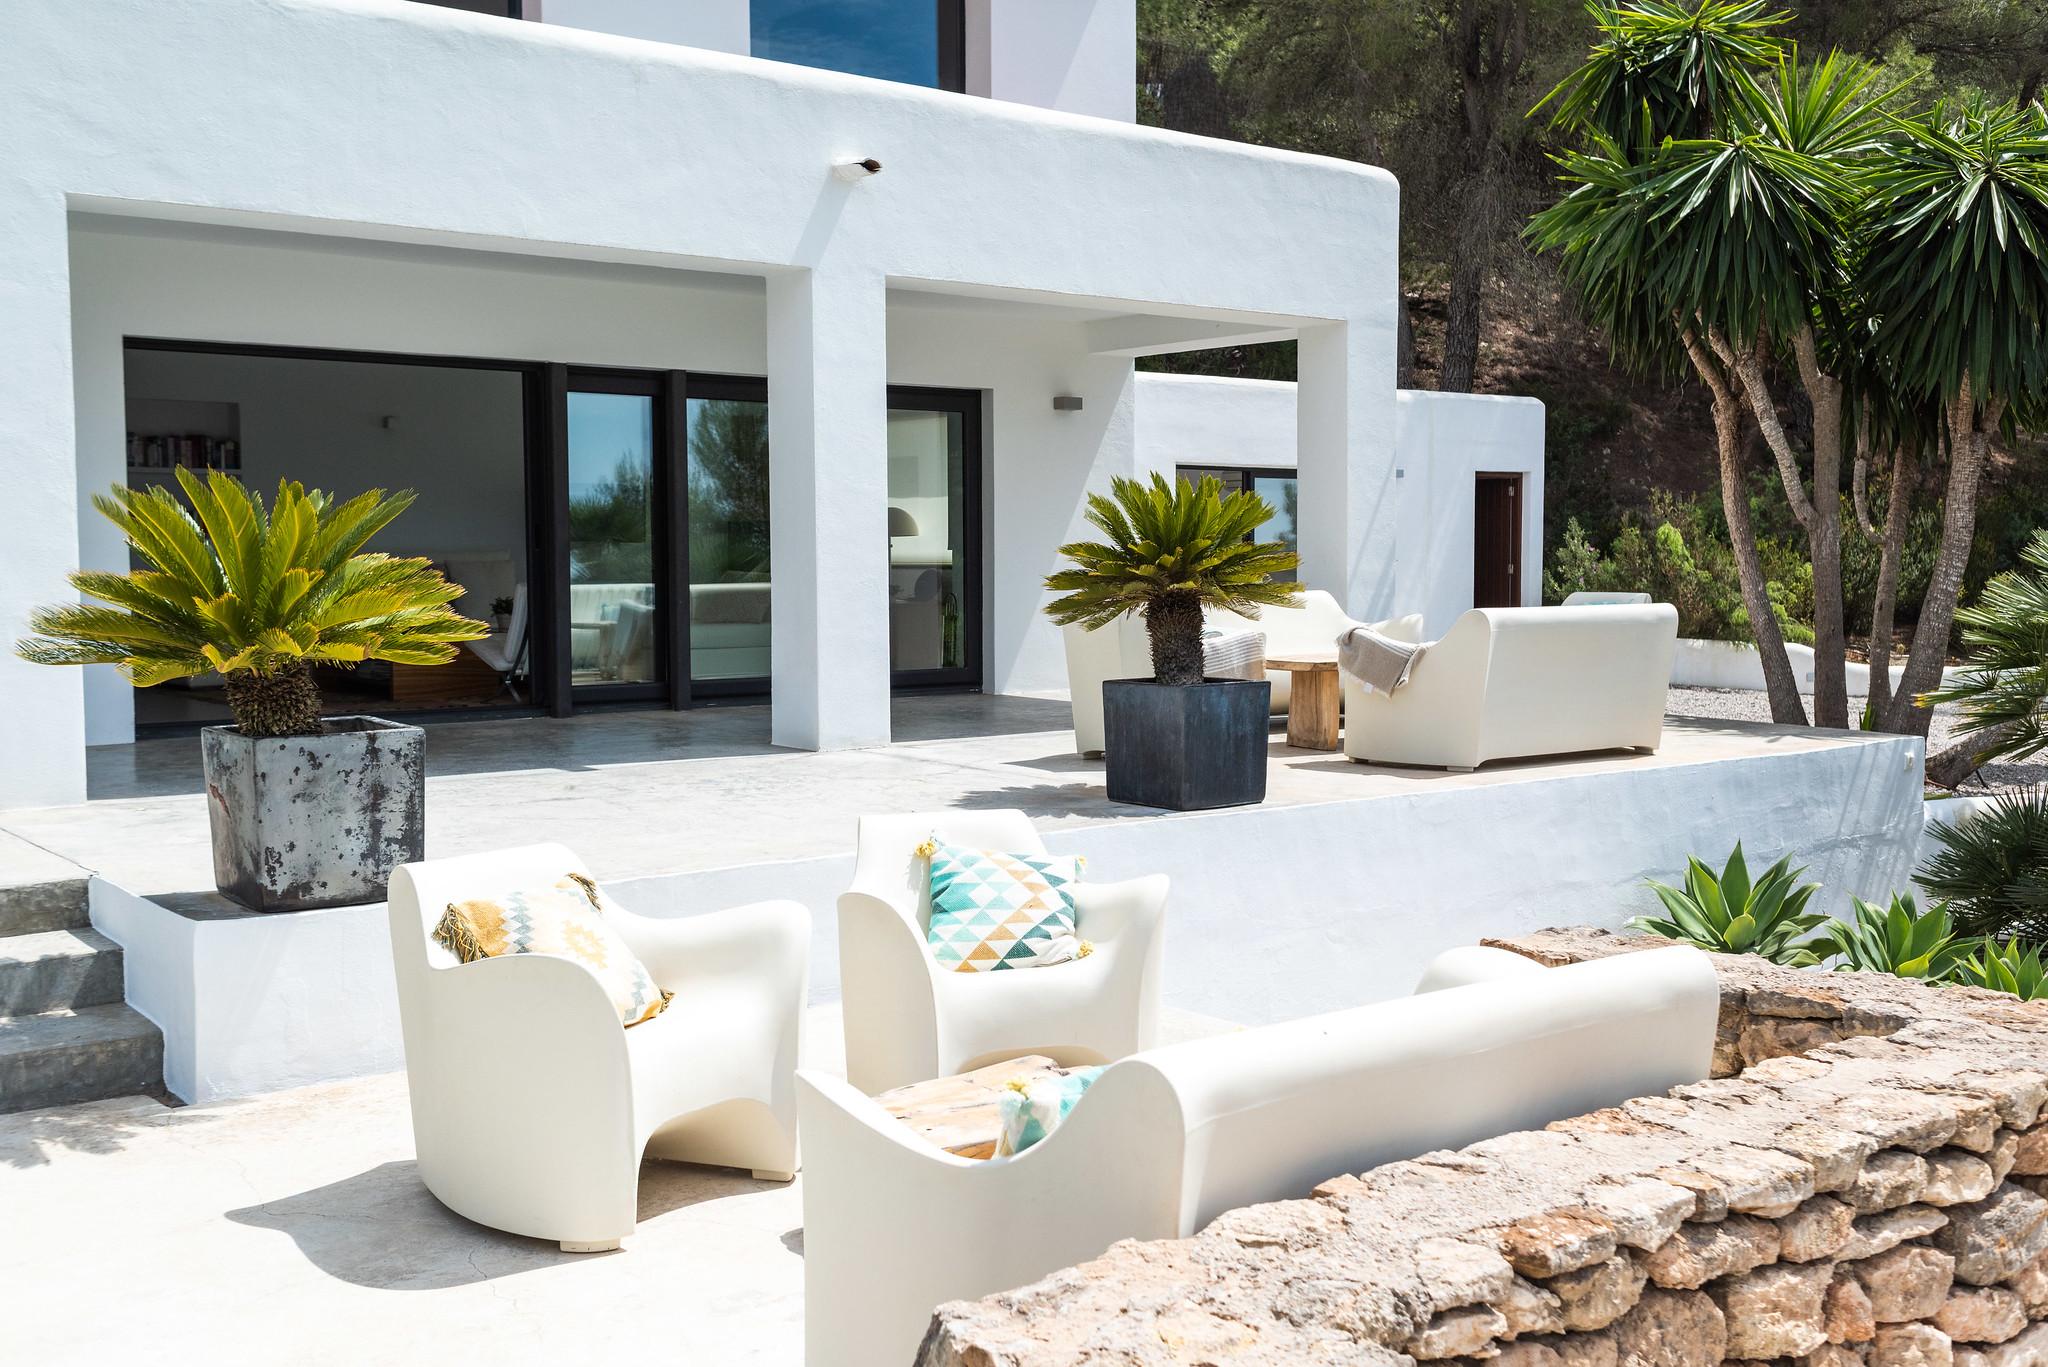 https://www.white-ibiza.com/wp-content/uploads/2020/06/white-ibiza-villas-villa-azul-exterior-outside-seating.jpg